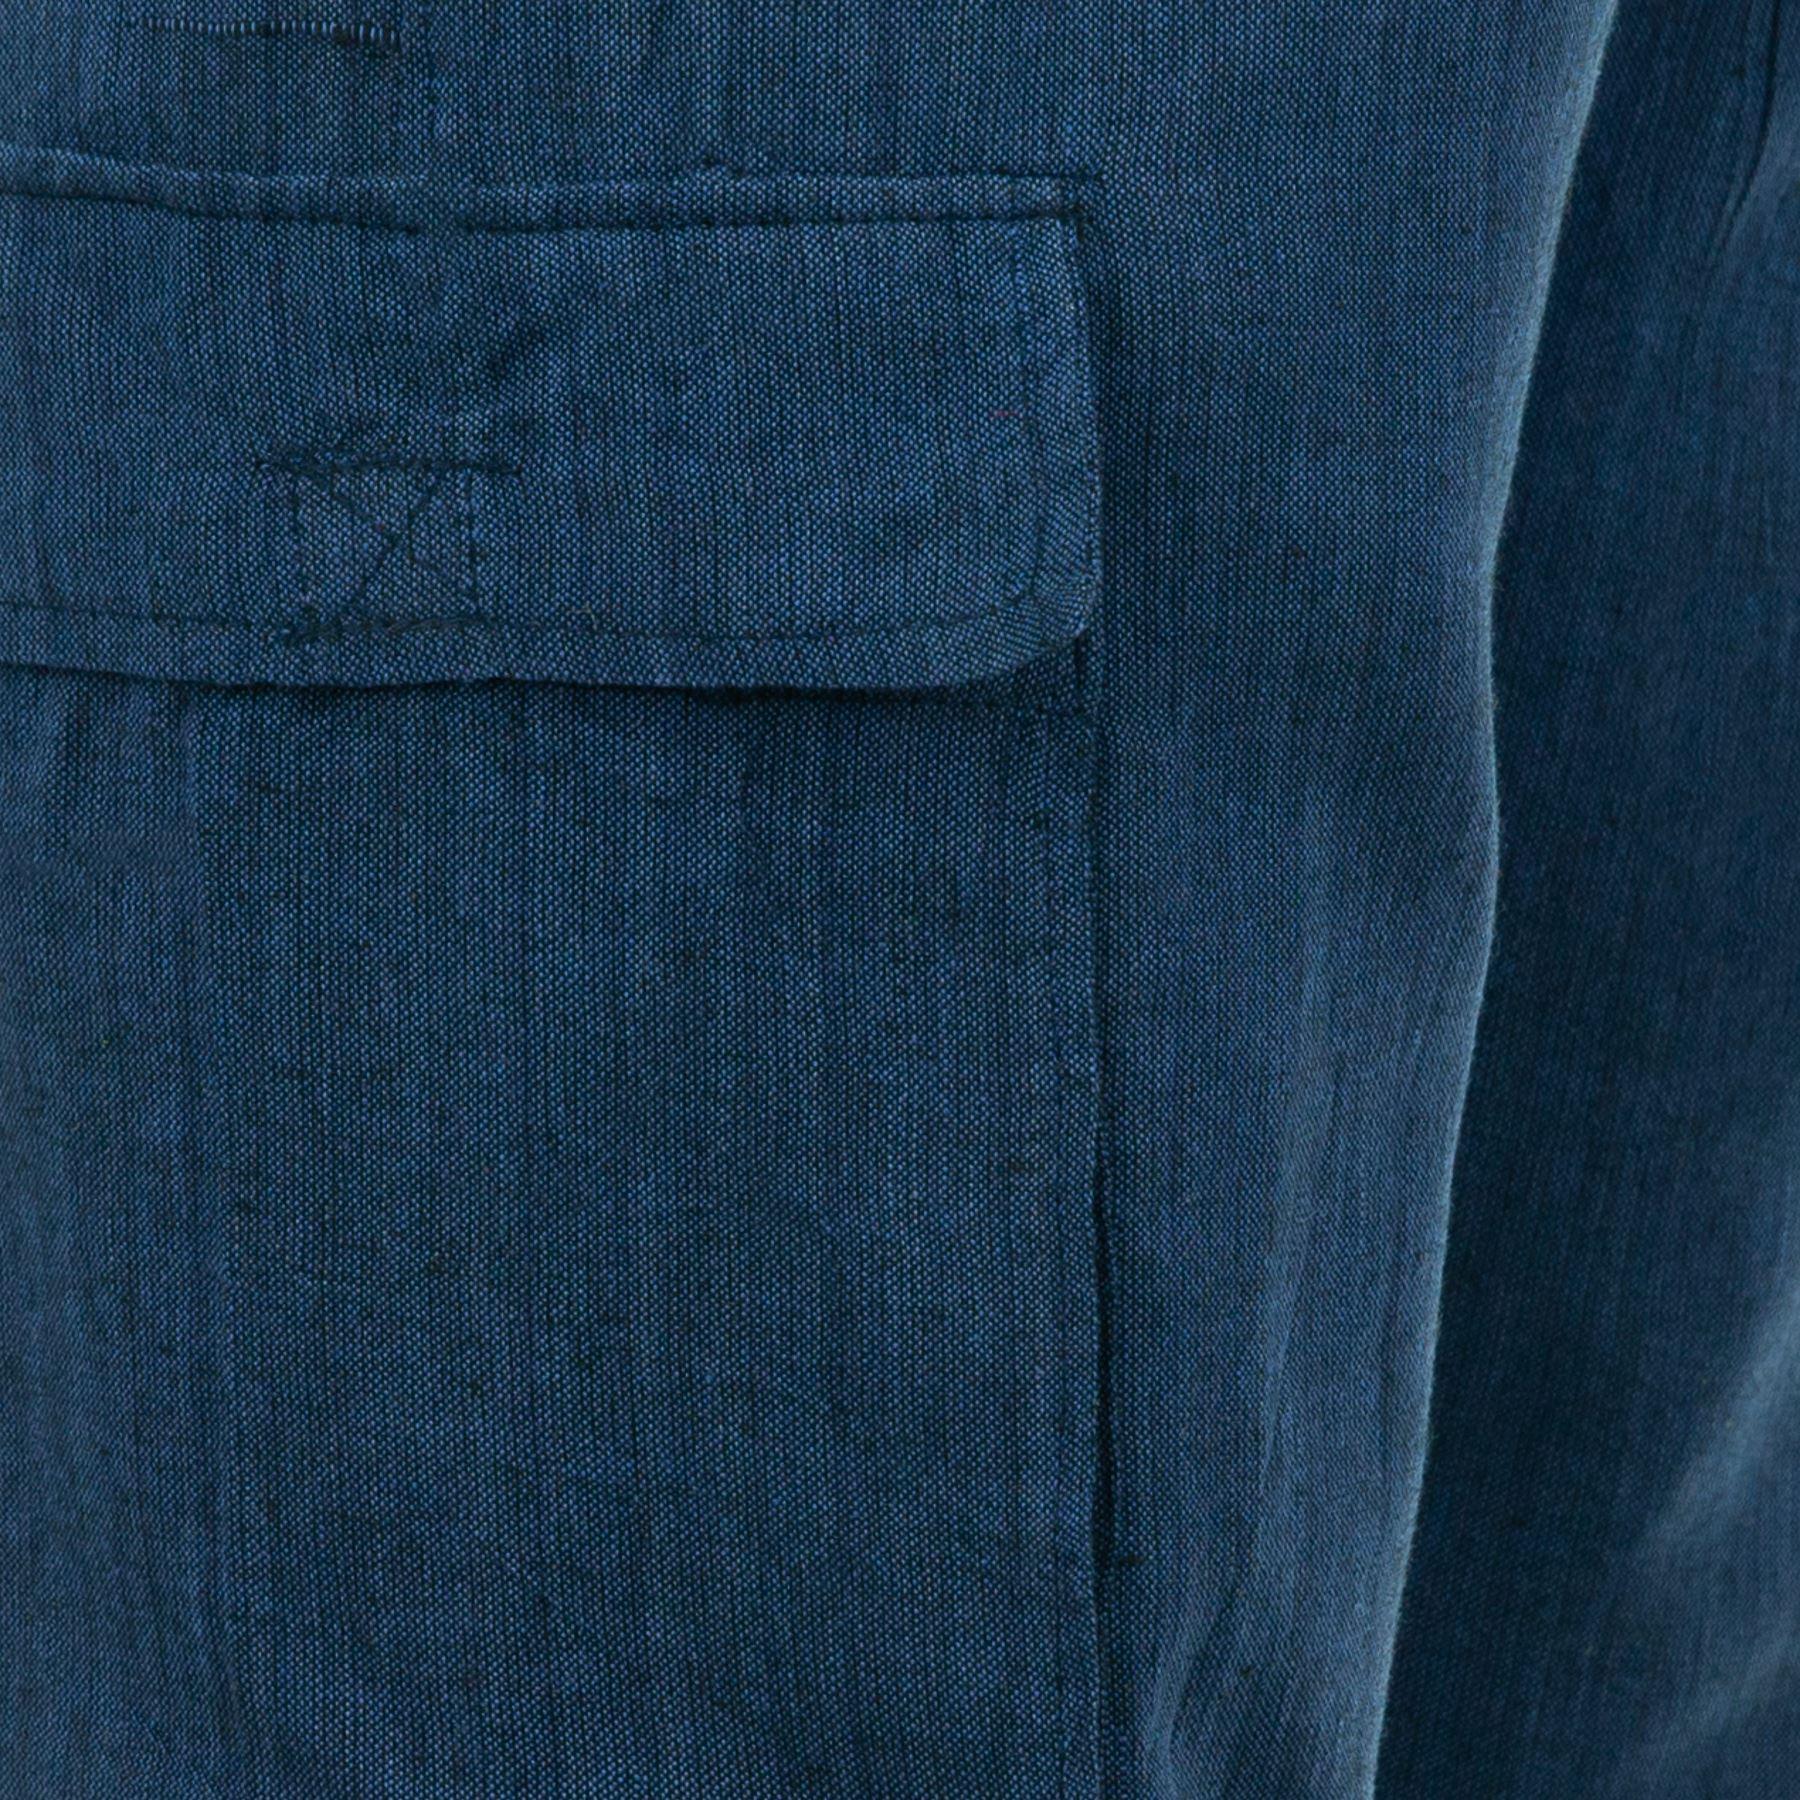 Cotone Militare Pantaloni Elastico Tasche Larga Luce Nepal